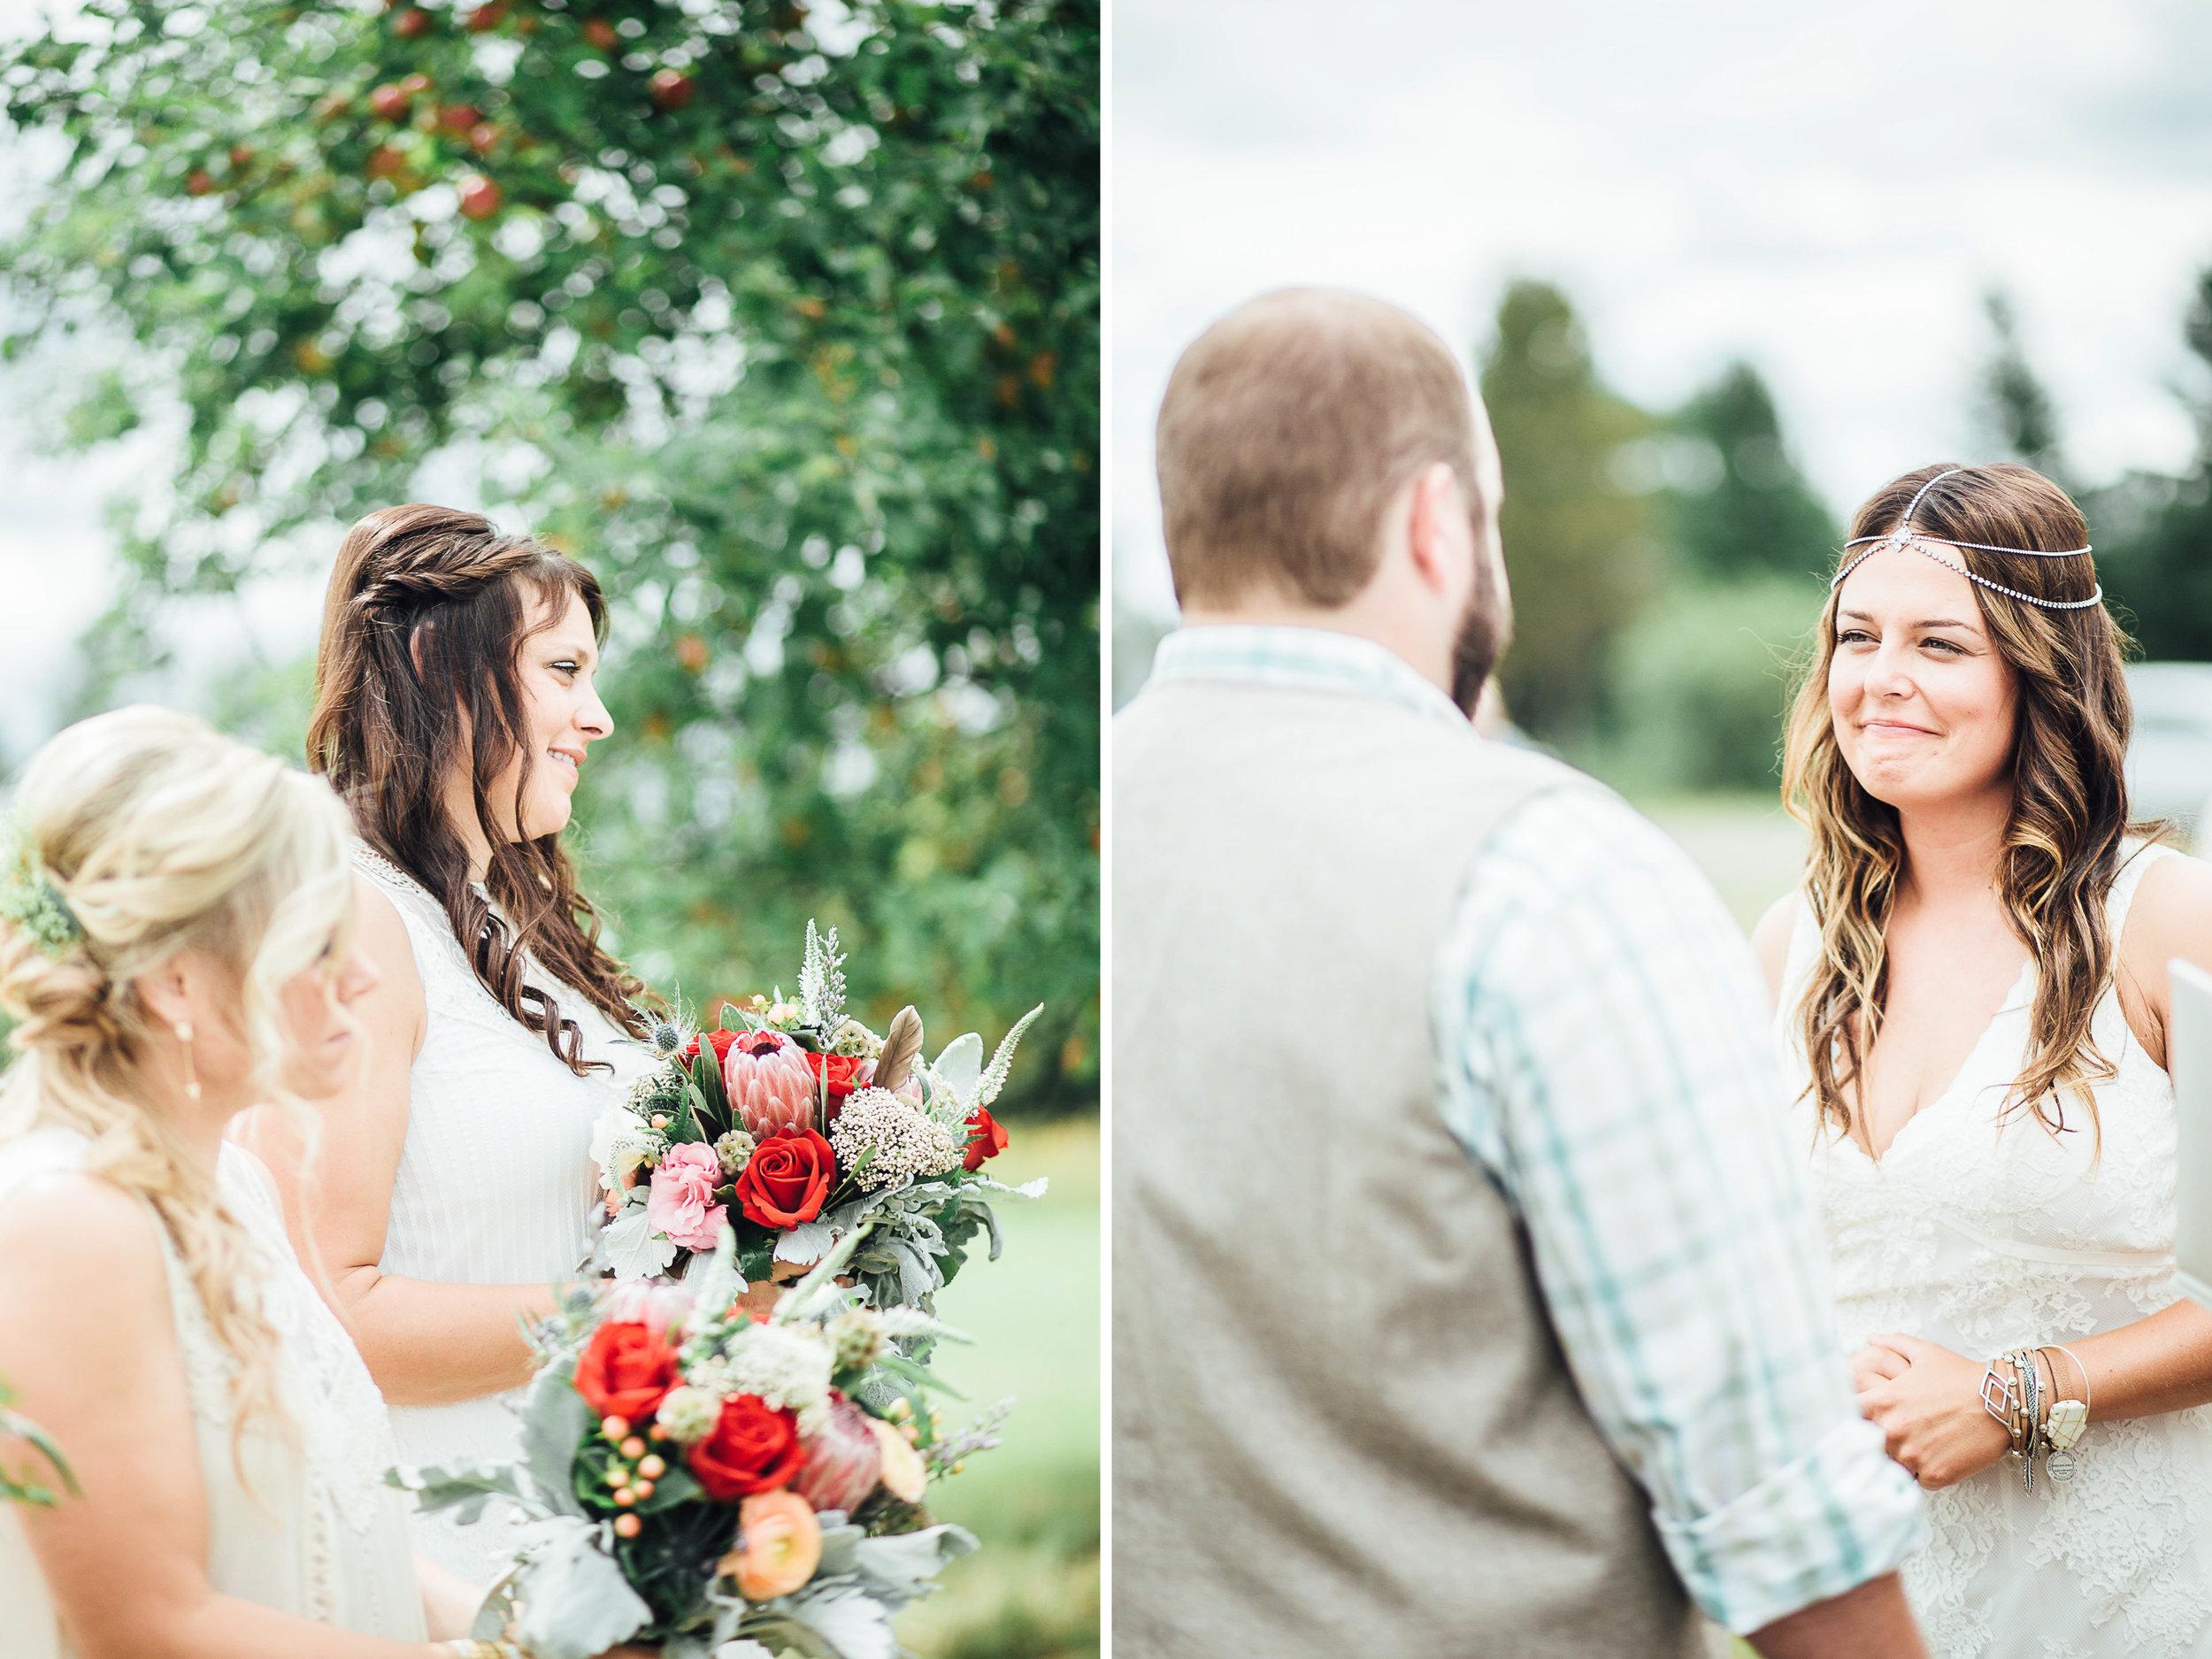 Bohemian Wedding - Sabrina Leigh Studios - Northern Michigan Wedding Photographer052.jpg